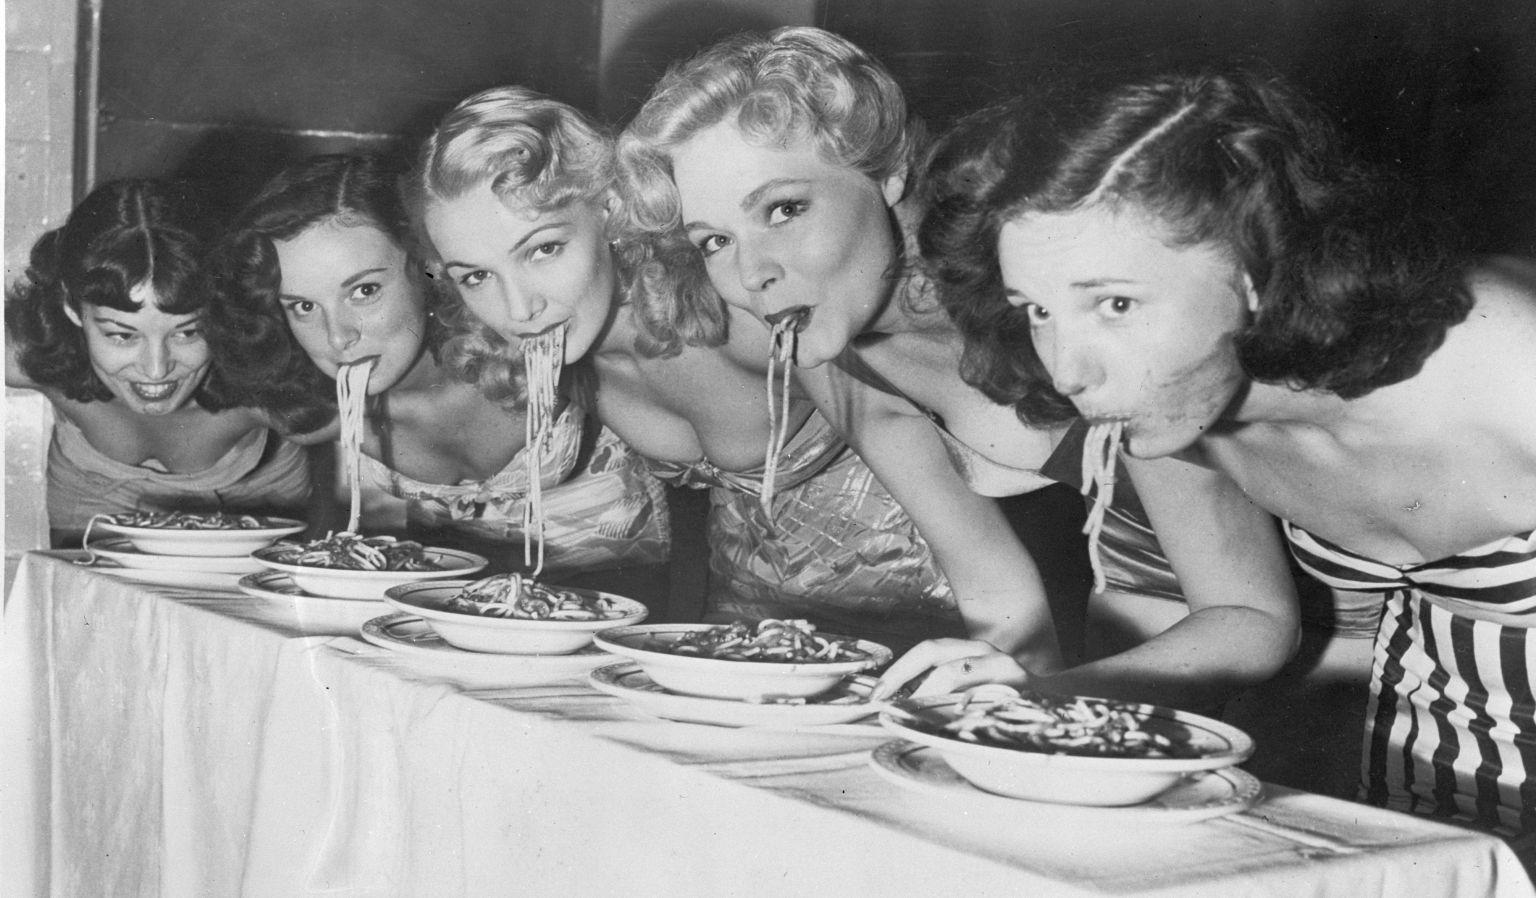 Конкурс по поеданию спагетти